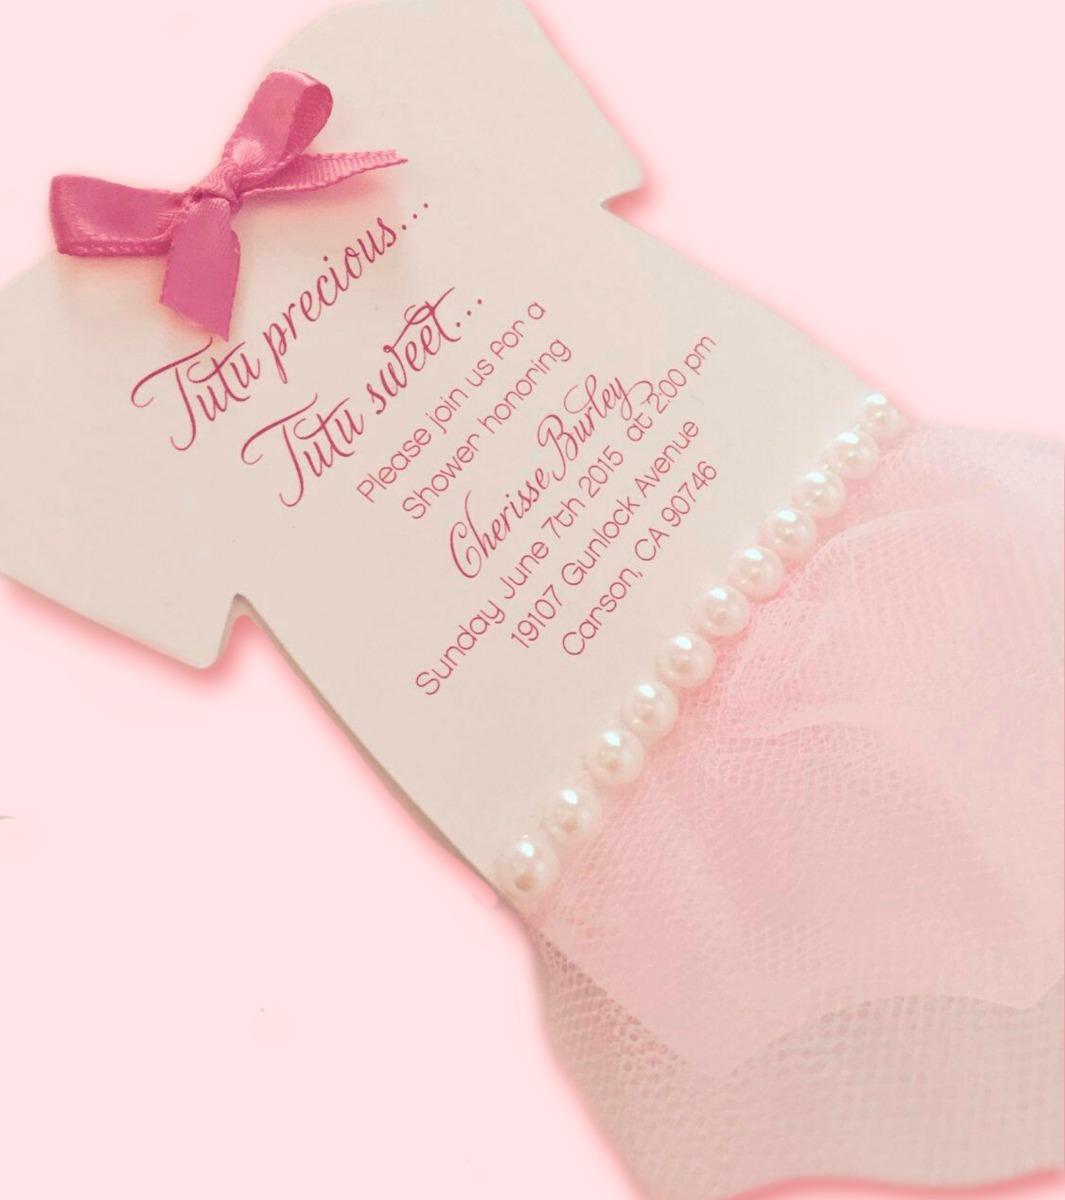 8ecab7ae92a83 Tarjeta Invitación Para Baby Shower Bailarina -   2.500 en Mercado Libre